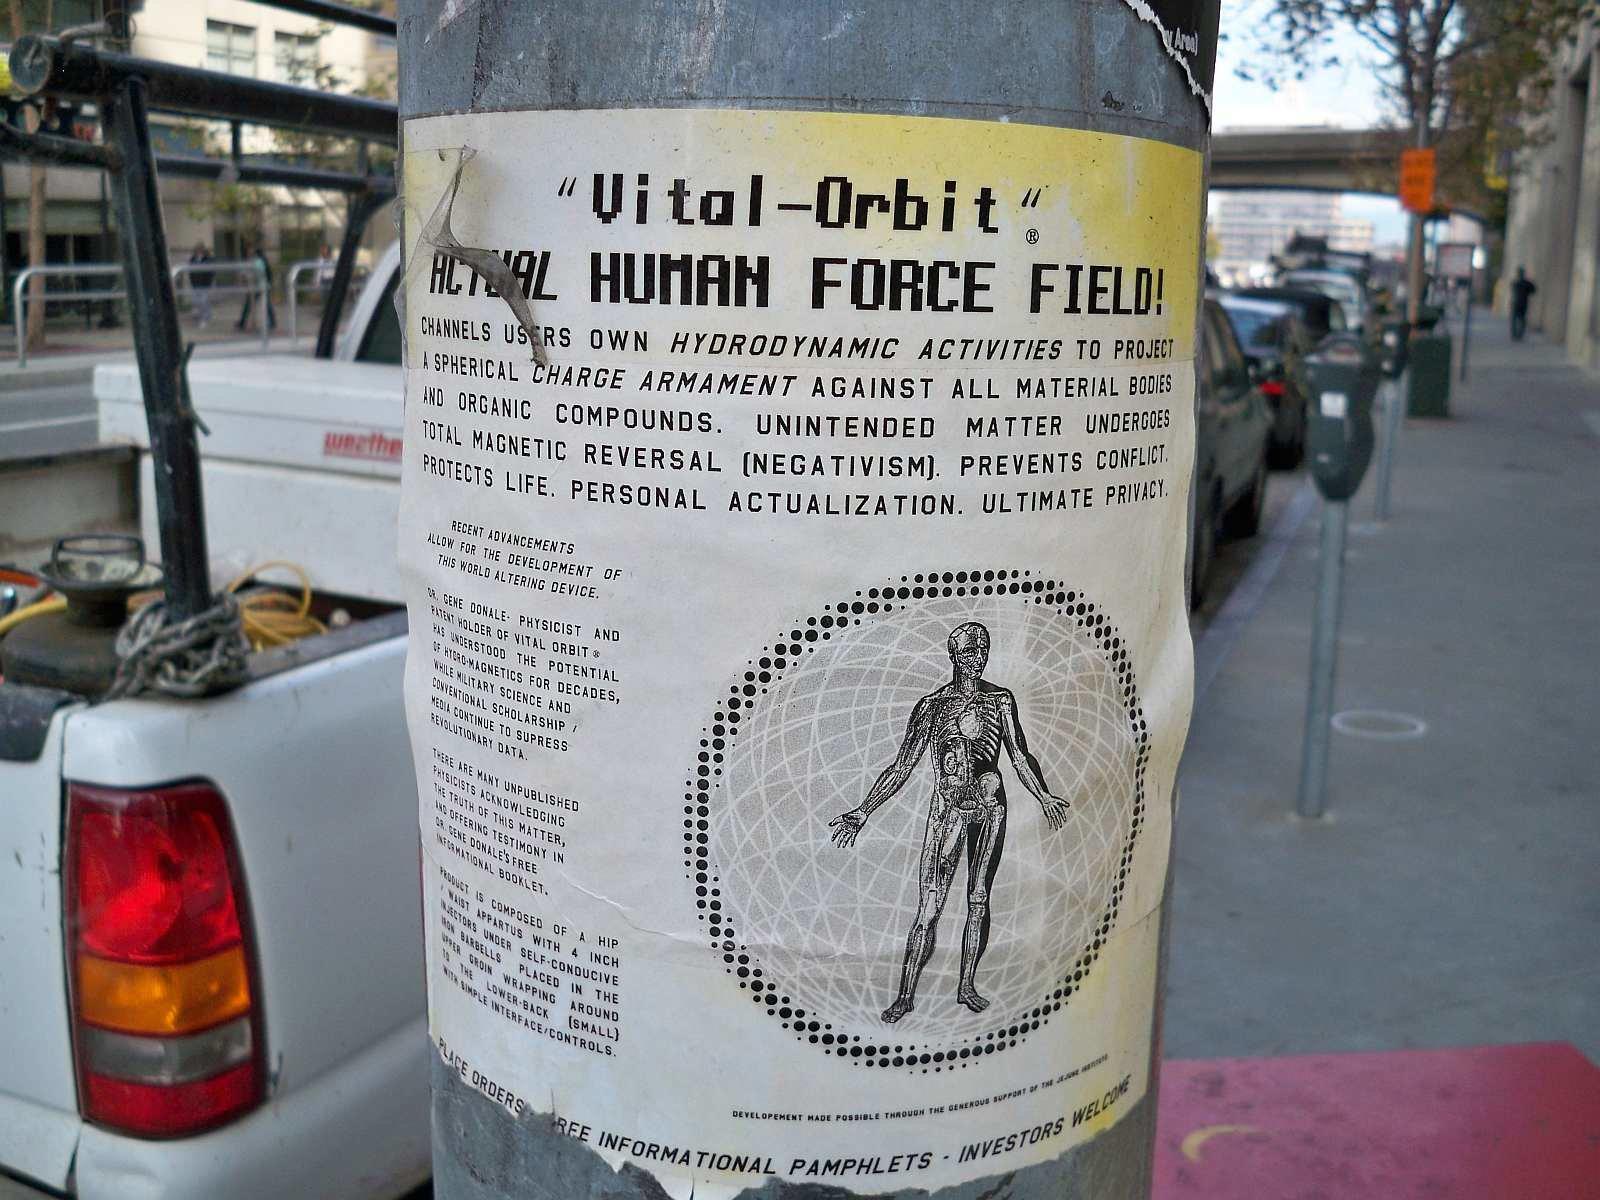 viral-orbit.jpg